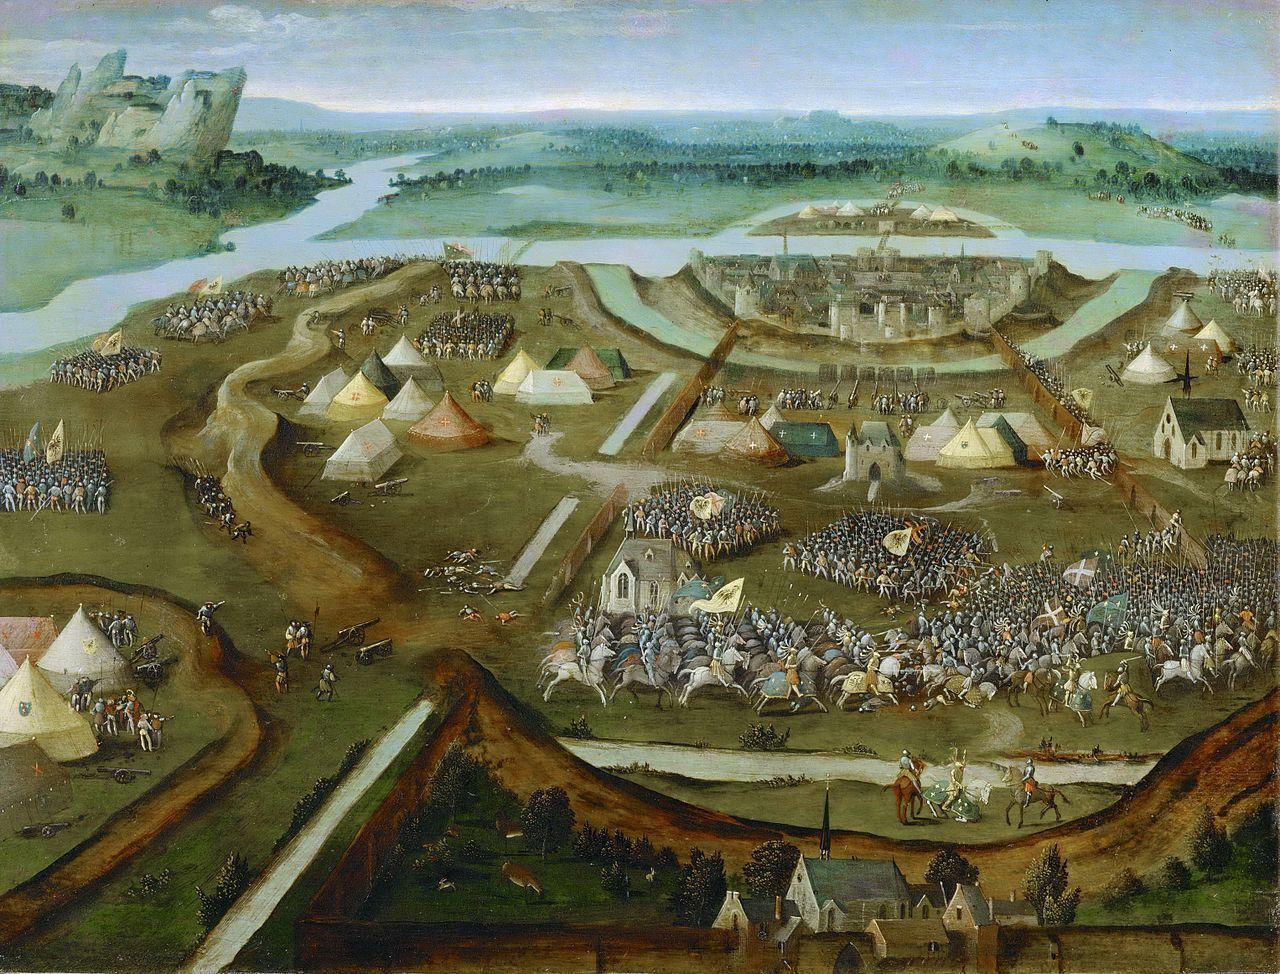 Bataille de Pavie - 1525 - Joachim Patinir